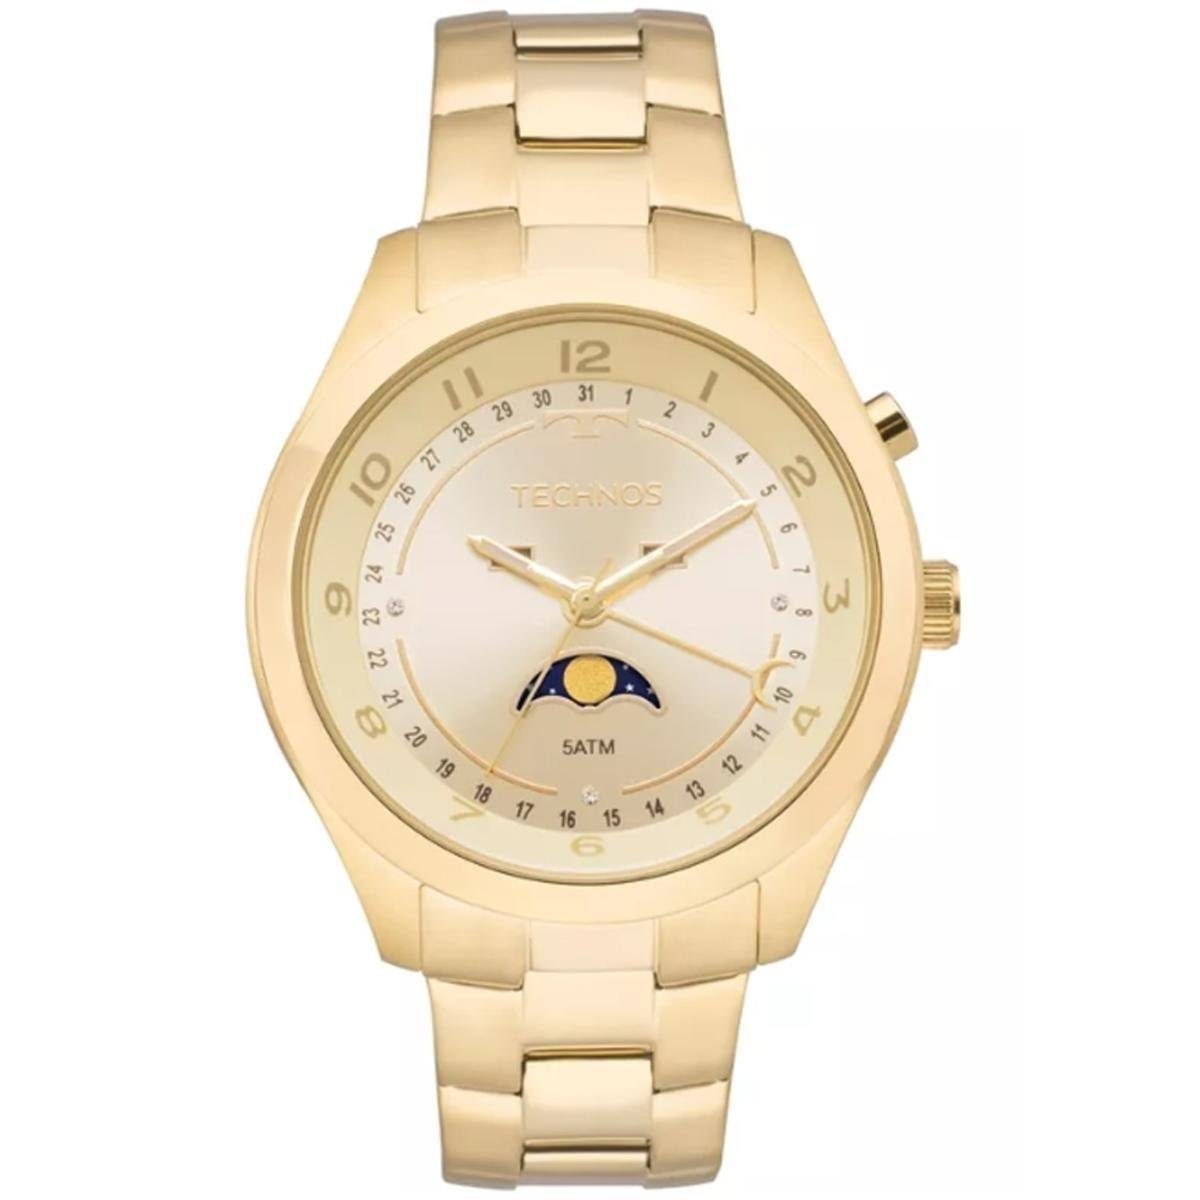 a6baf886ade72 Relógio Feminino Technos Ladies 6P80aa 4X - Compre Agora   Zattini